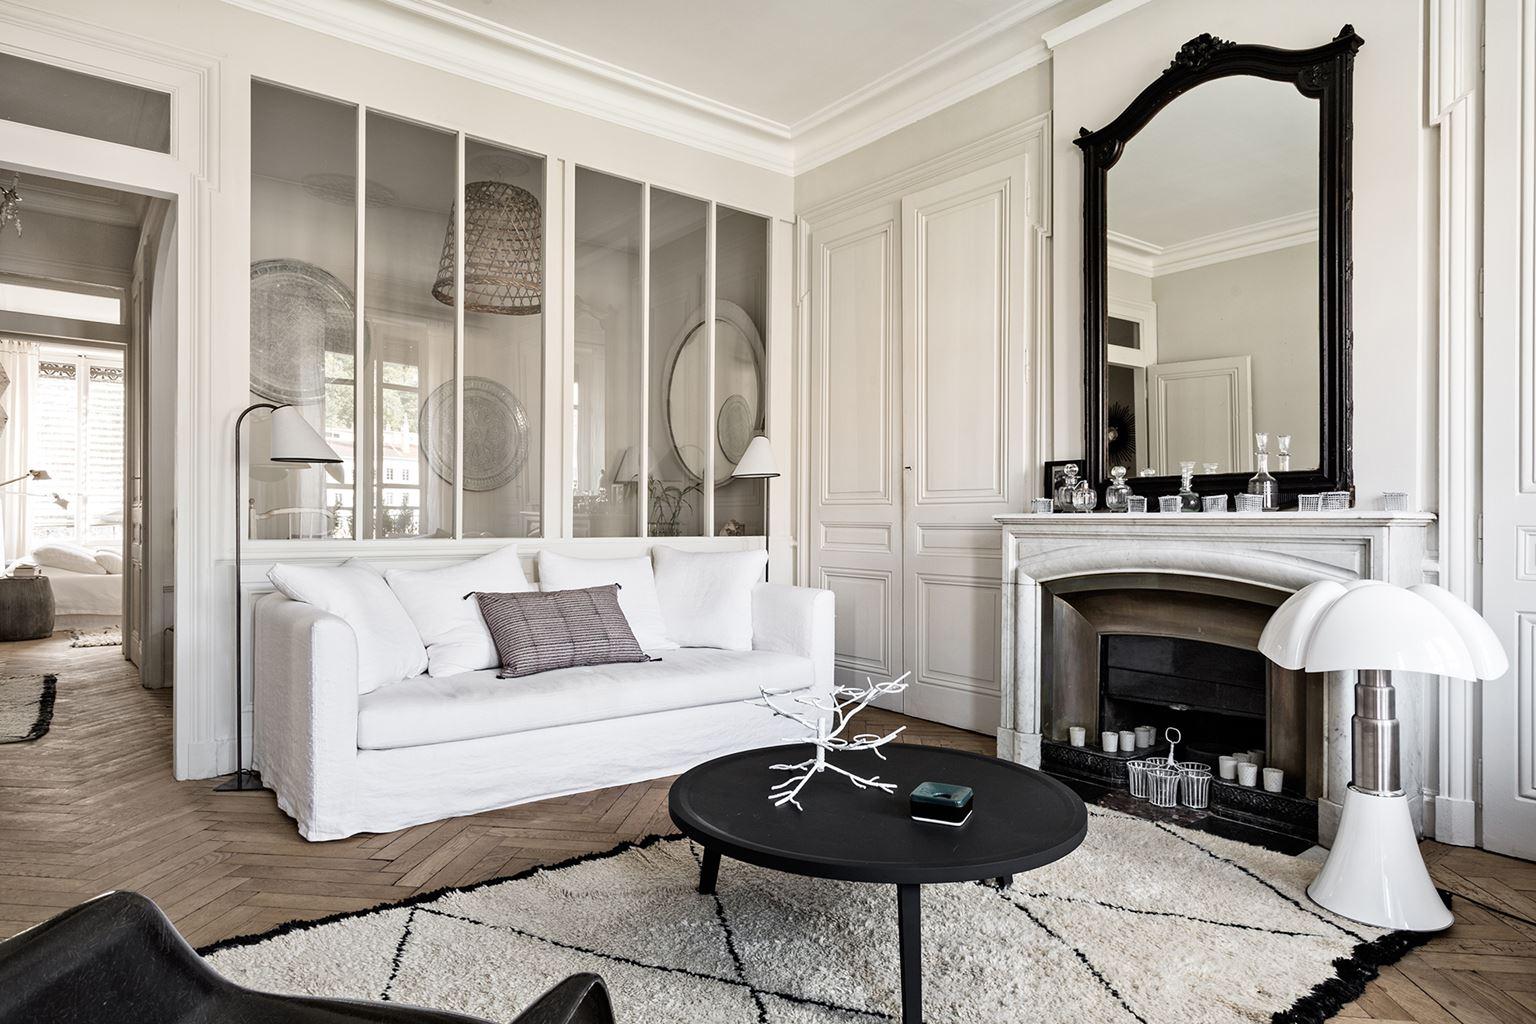 Однокомнатная квартира в стиле прованс монохромная